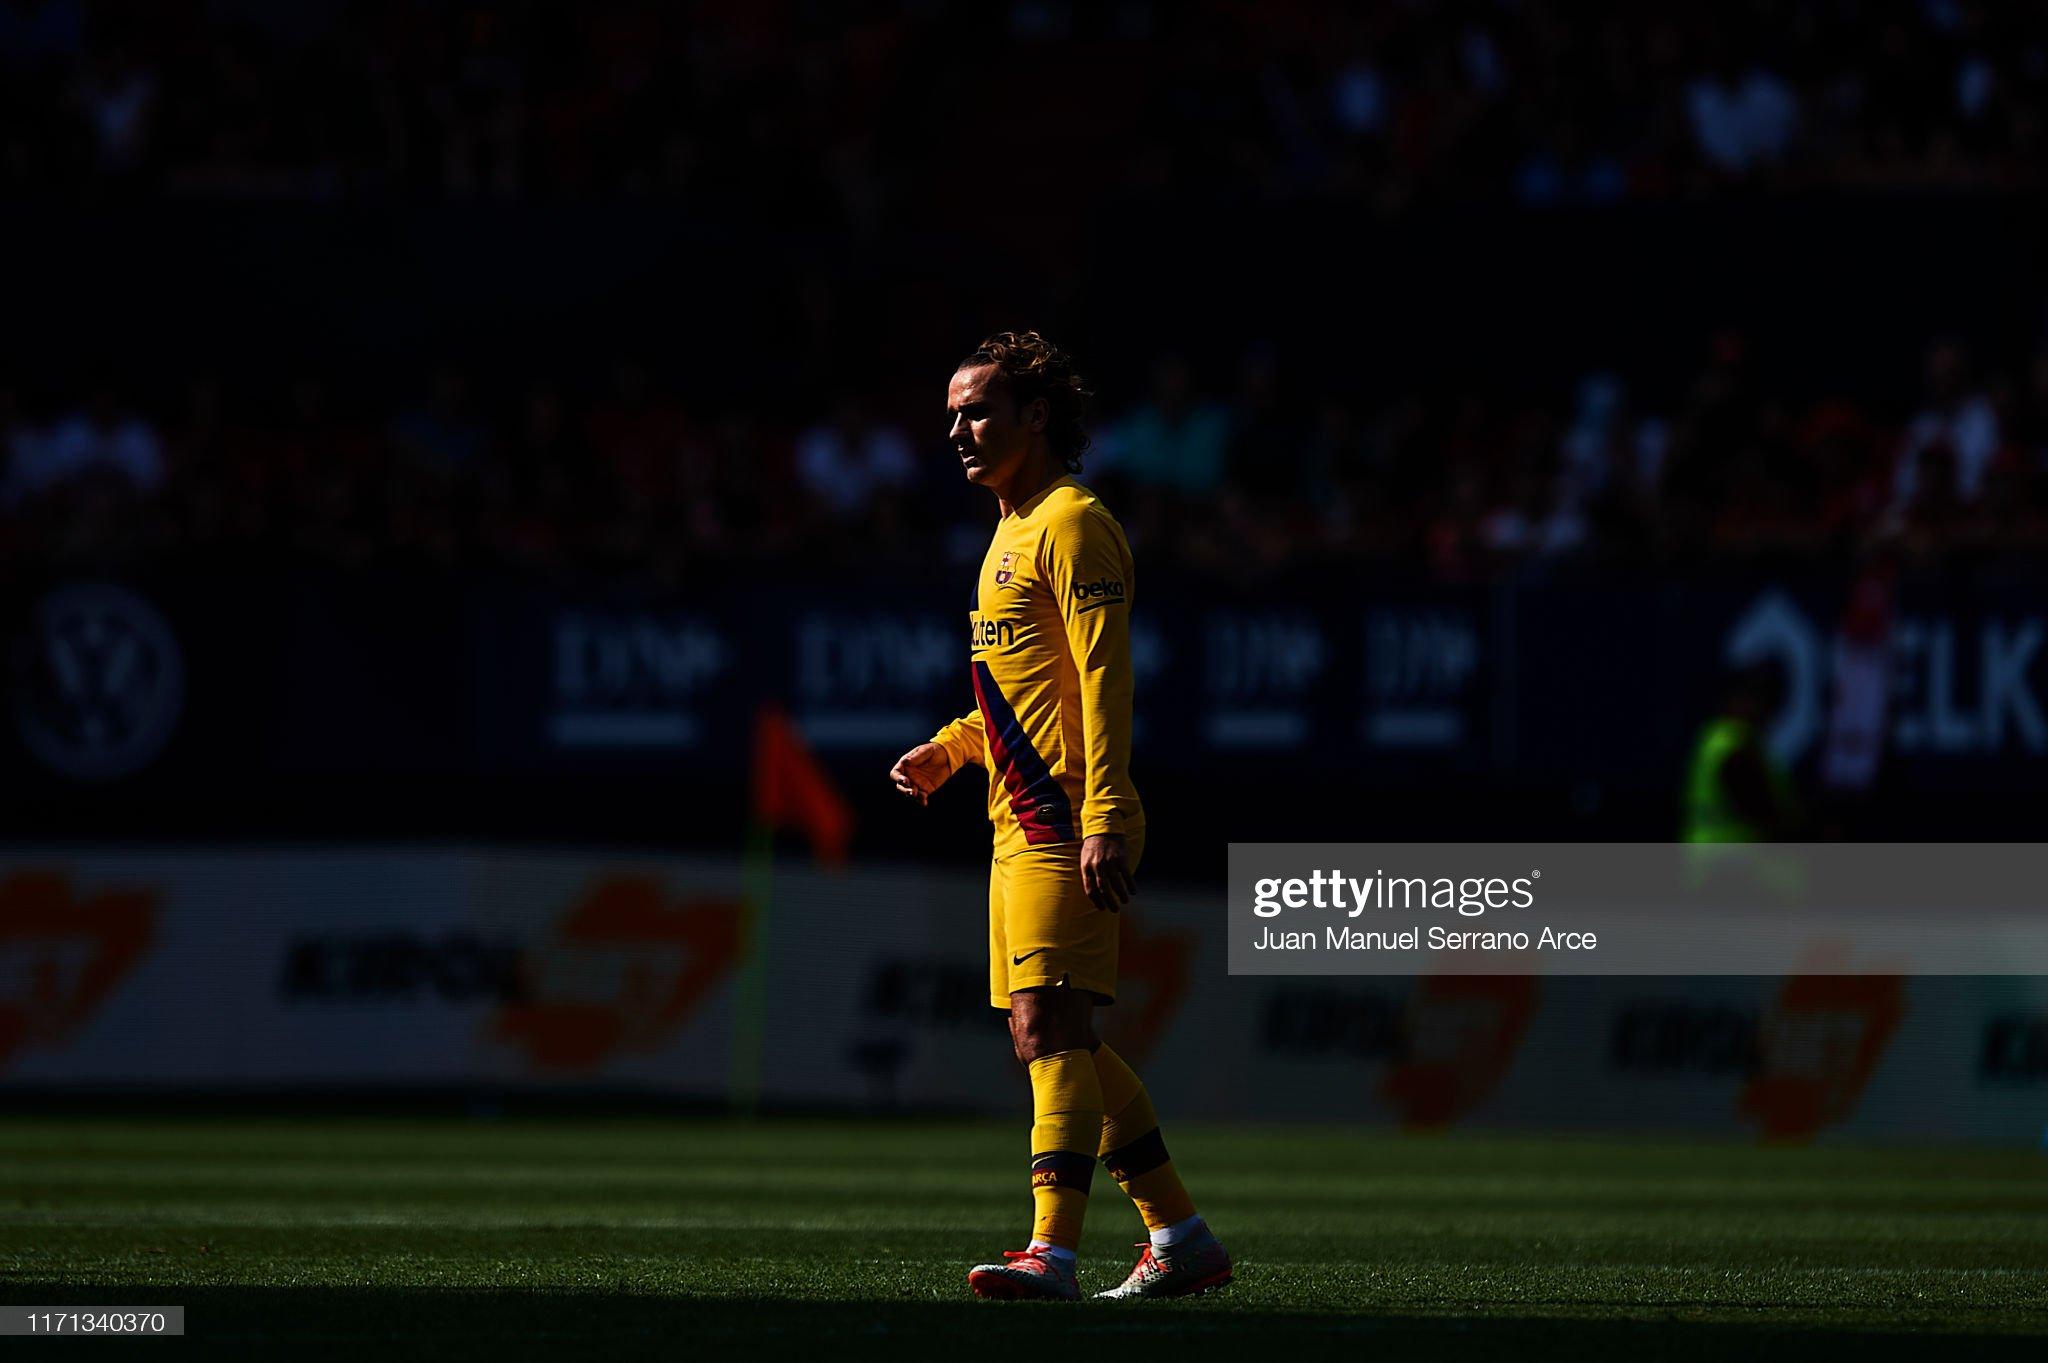 صور مباراة : أوساسونا - برشلونة 2-2 ( 31-08-2019 )  Antoine-griezmann-of-fc-barcelona-looks-on-during-the-liga-match-ca-picture-id1171340370?s=2048x2048